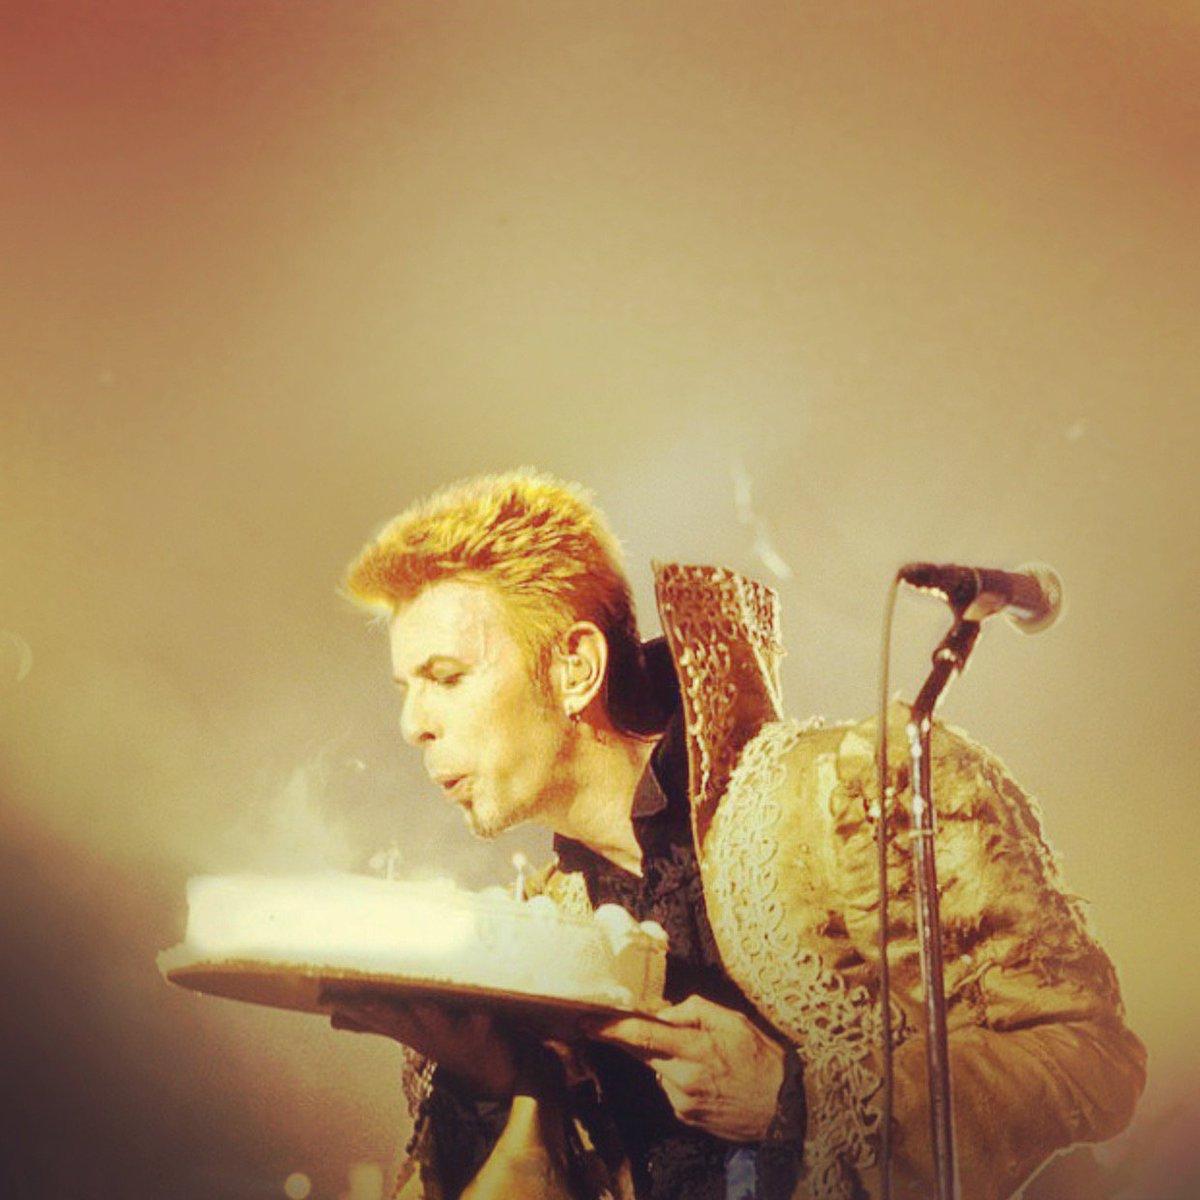 Mike Garson On Twitter Happy Birthday David Davidbowie Happybirthday Davidbowieforever Bowieforever Rememberinghim Carrythenews